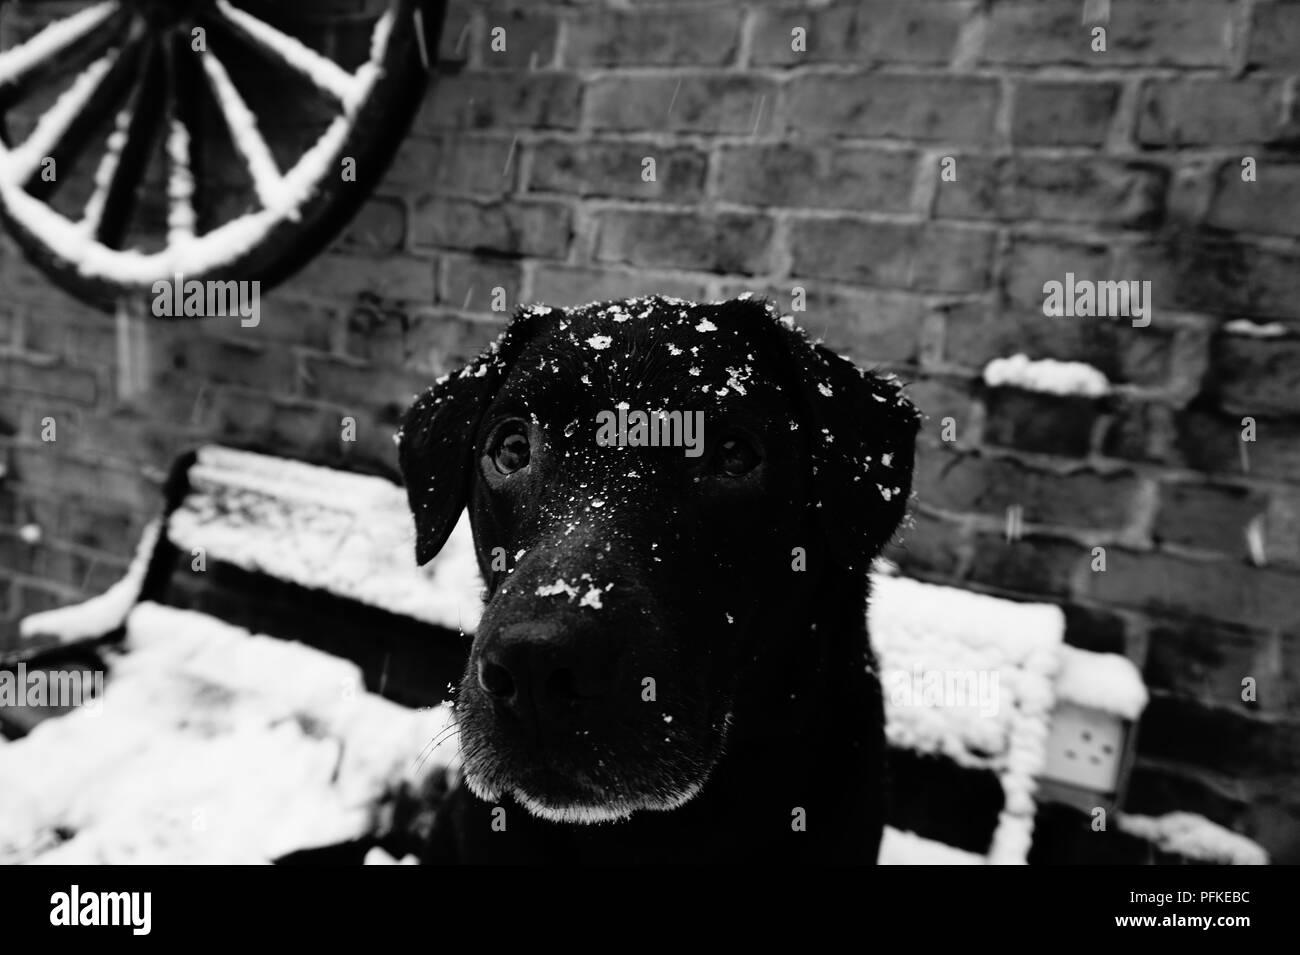 Labrador in the snow - Stock Image